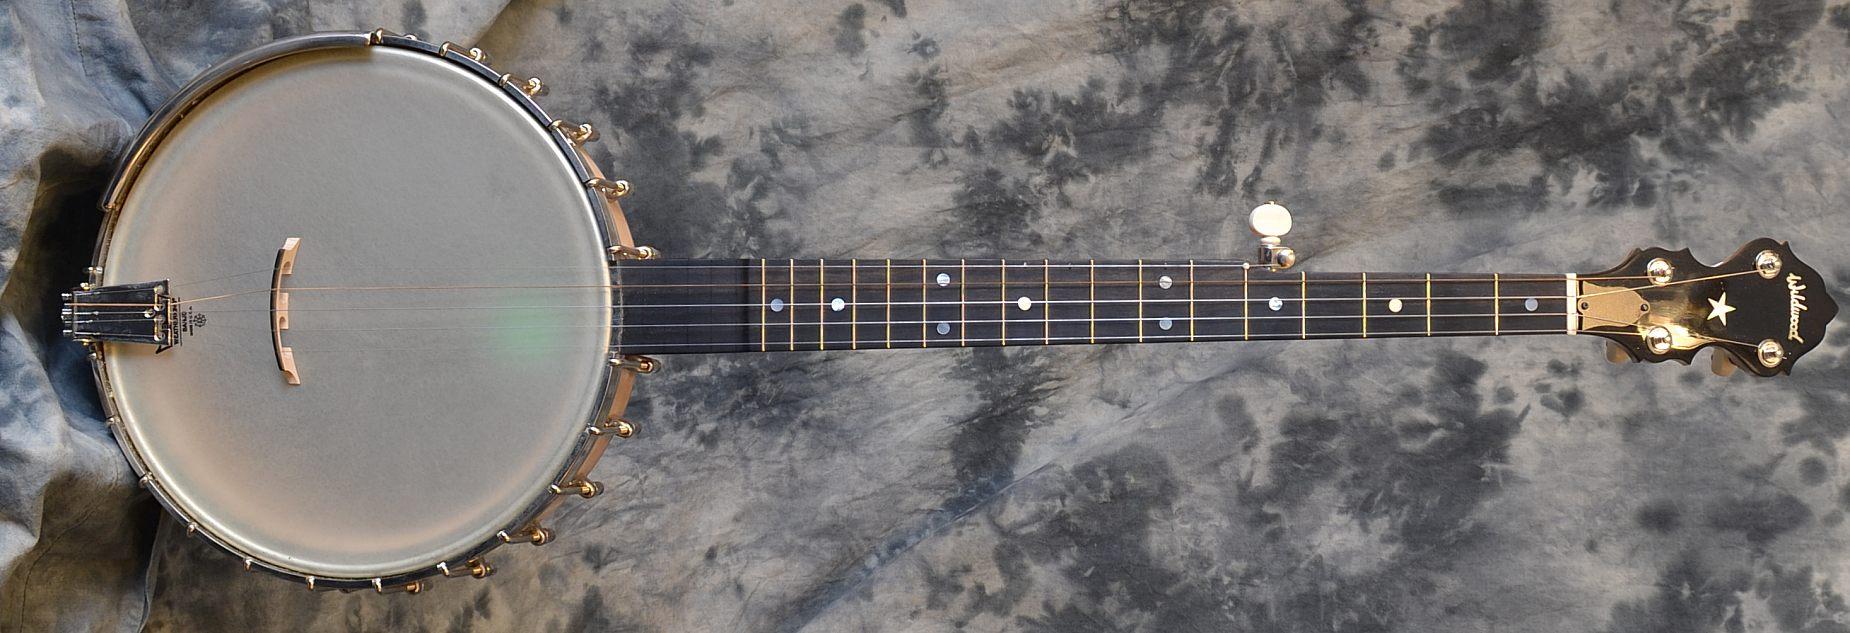 Wildwood Minstrel Open Back Banjo Full Front View